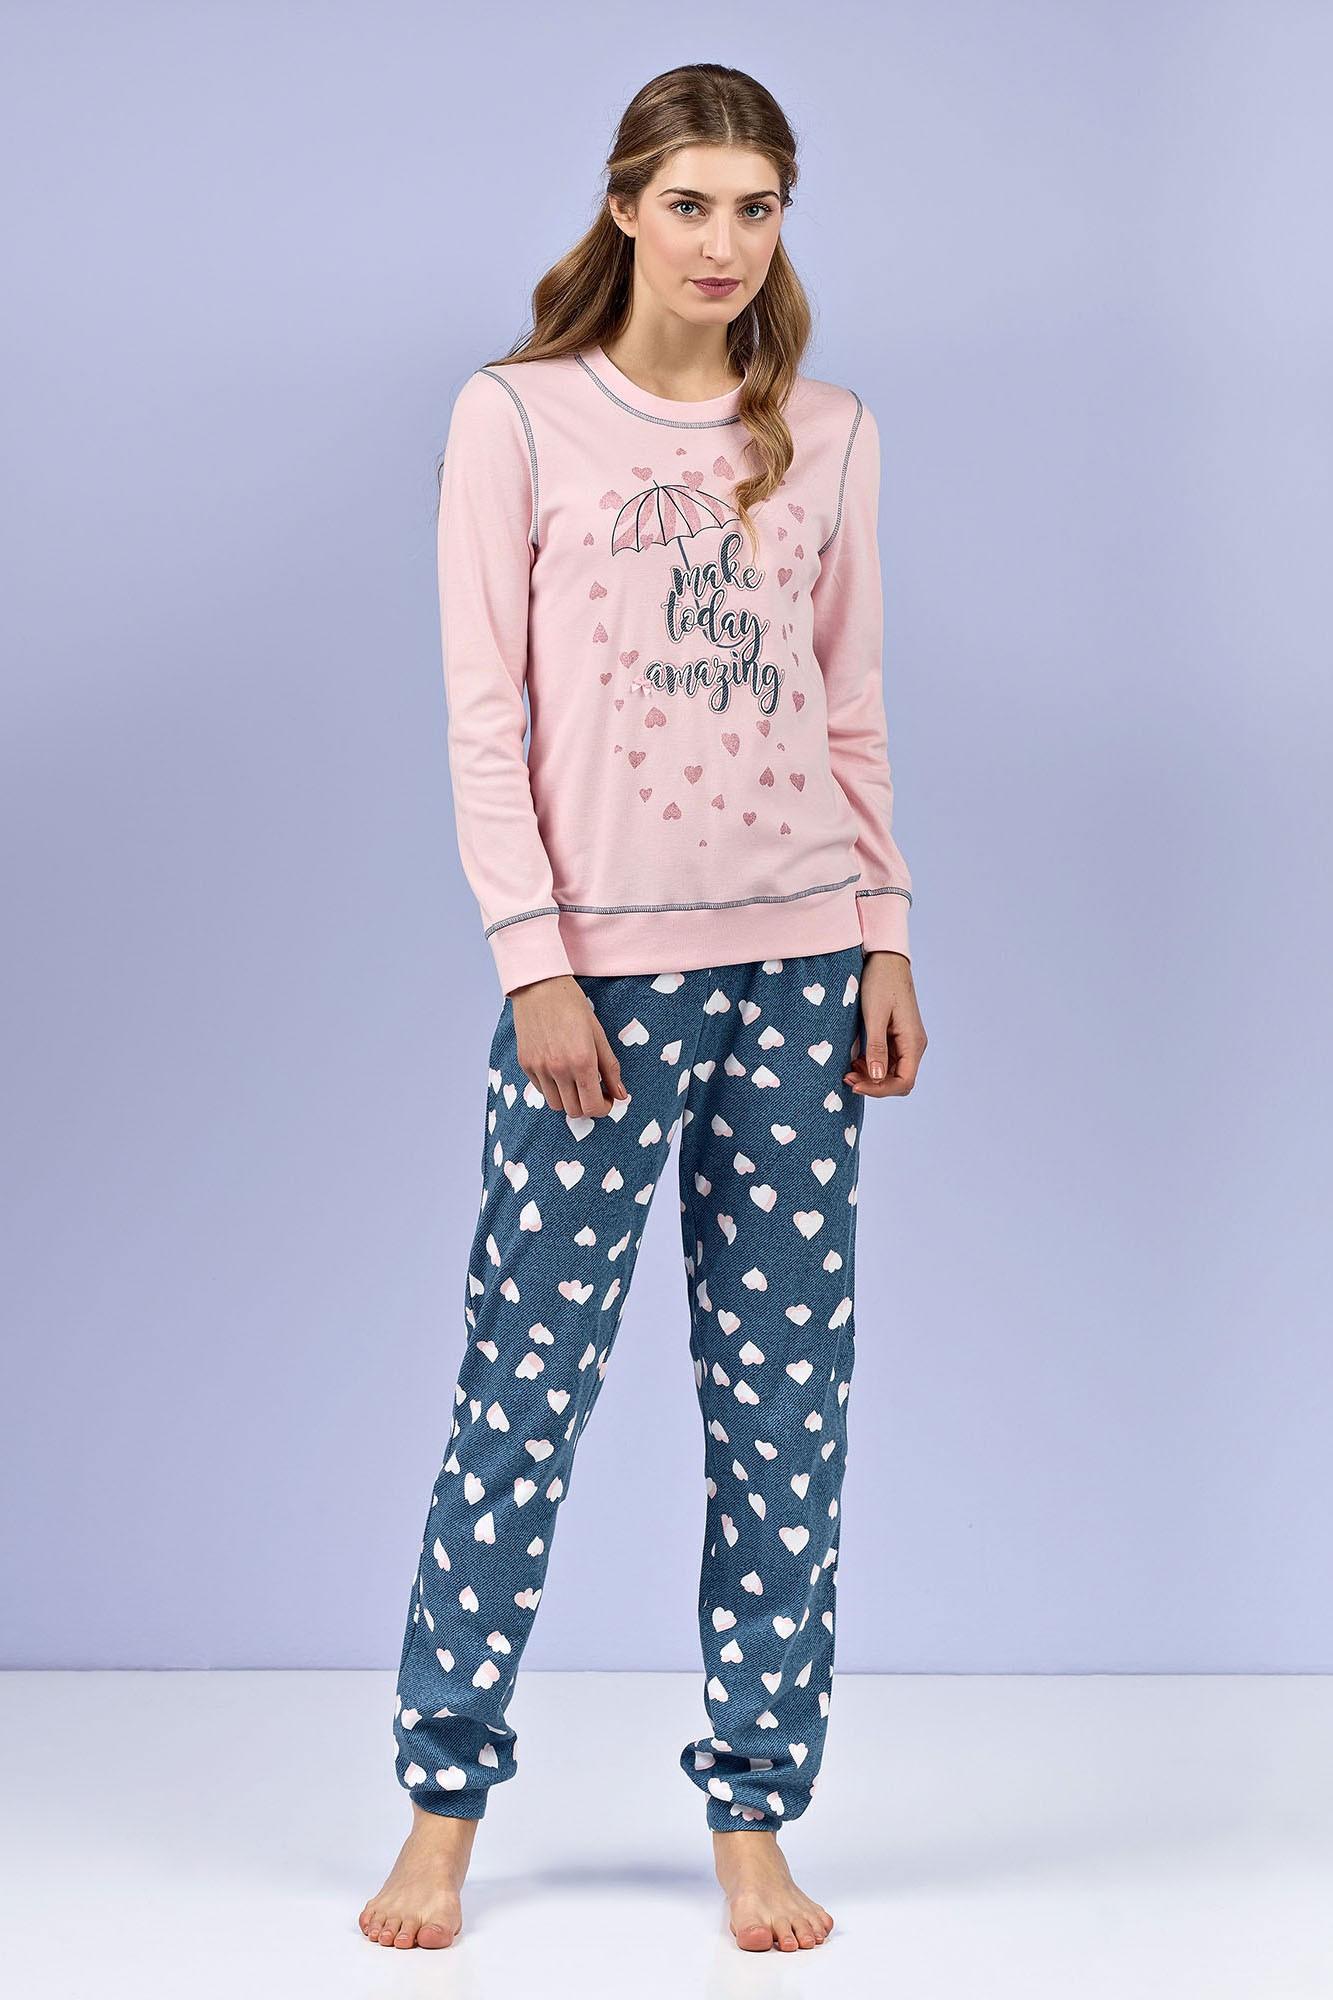 Dámské pyžamo 4977 - Vamp Barva: originál, Velikost: M